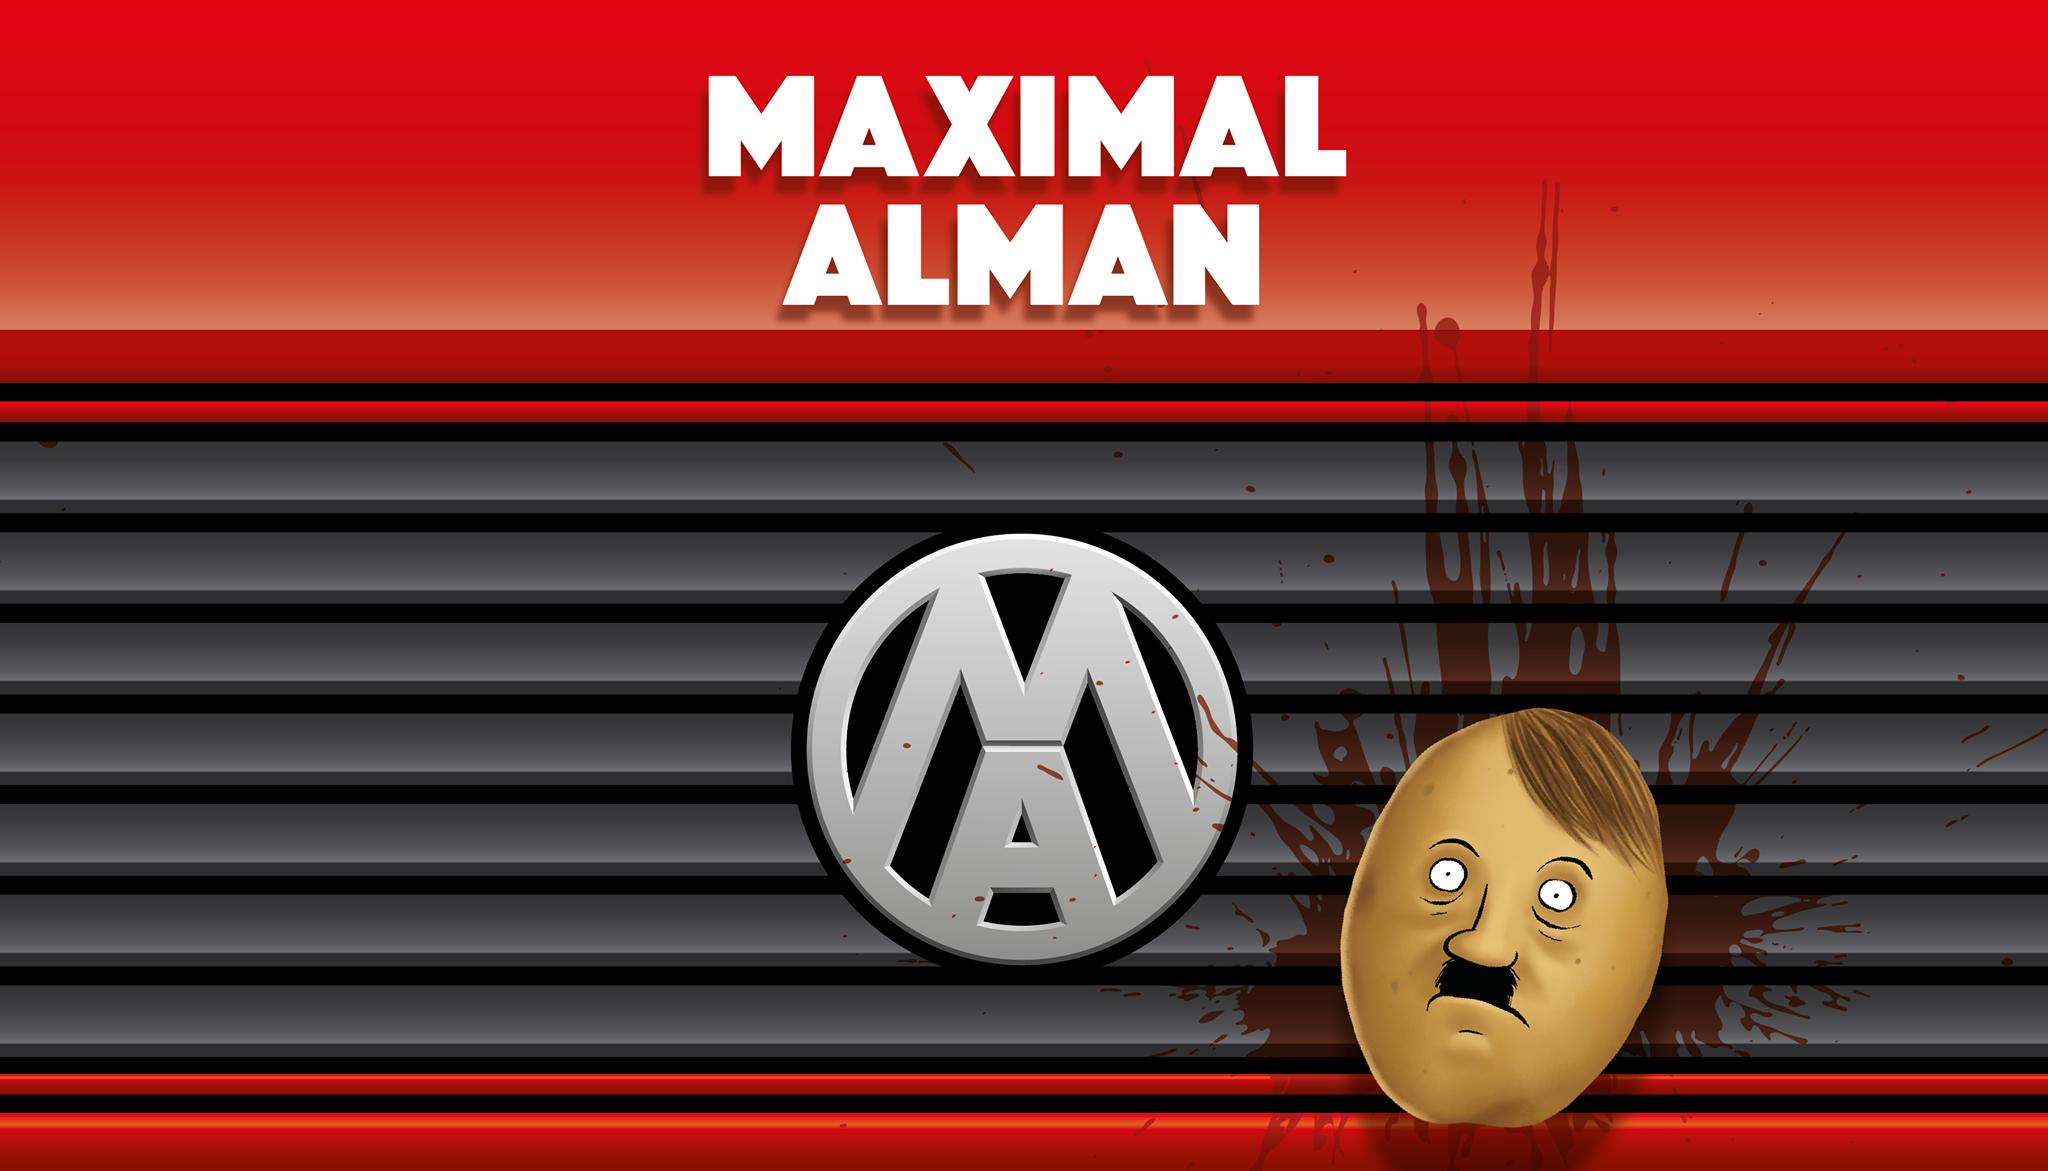 Maximal Alman